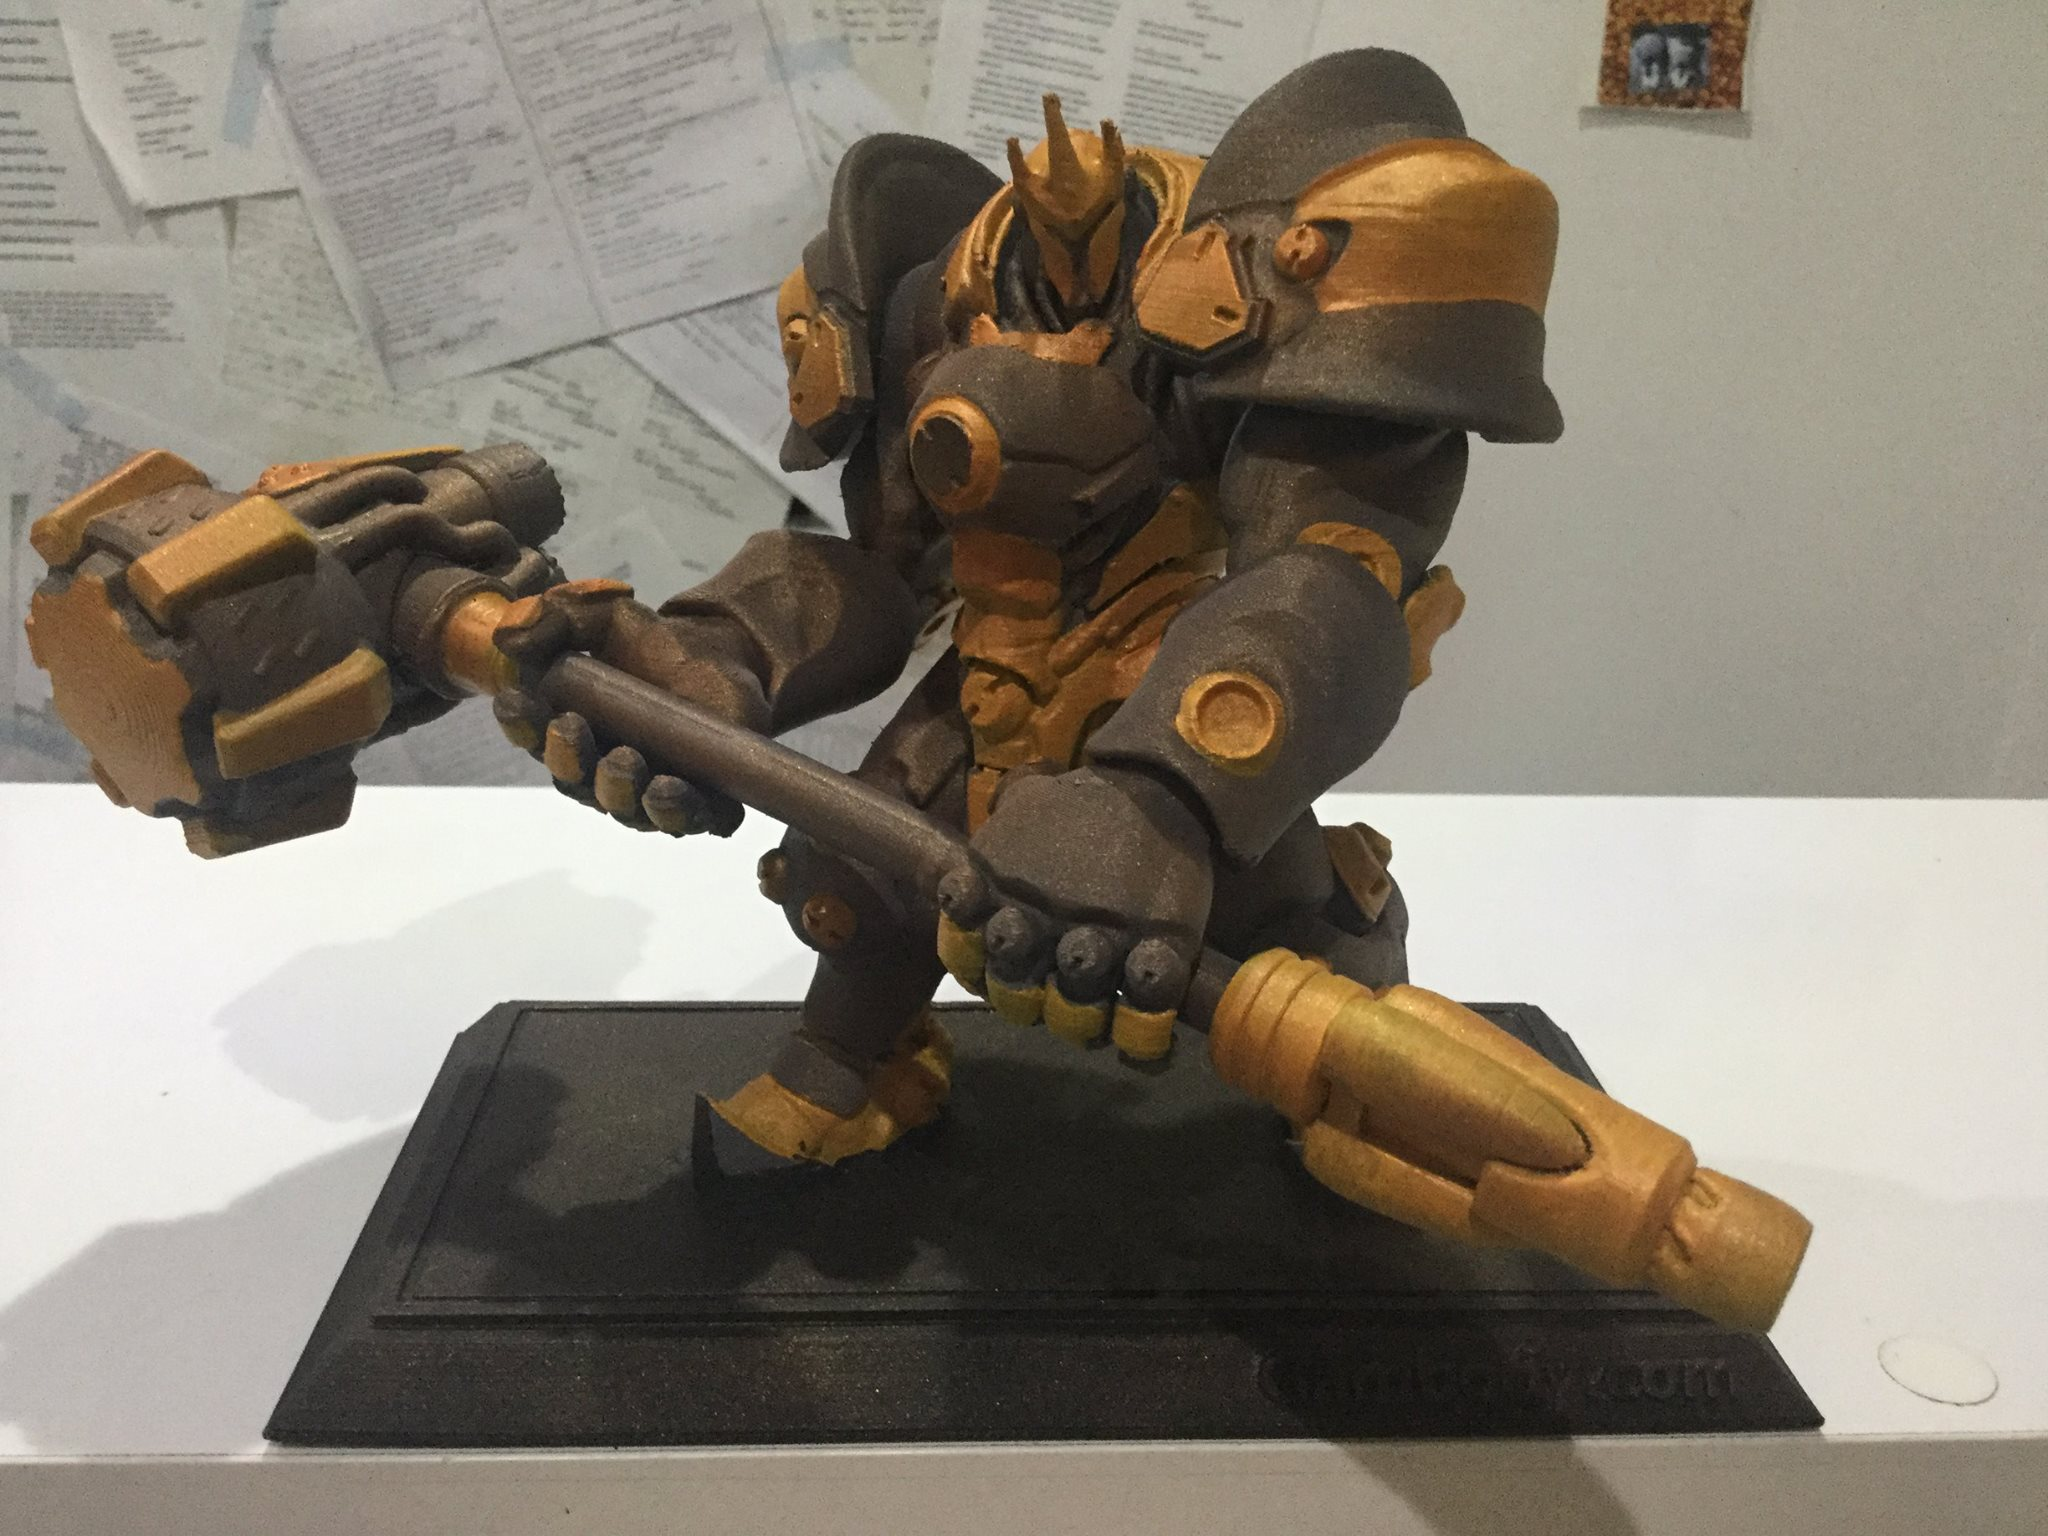 15 Overwatch 3D Models - Gambody, 3D Printing Blog